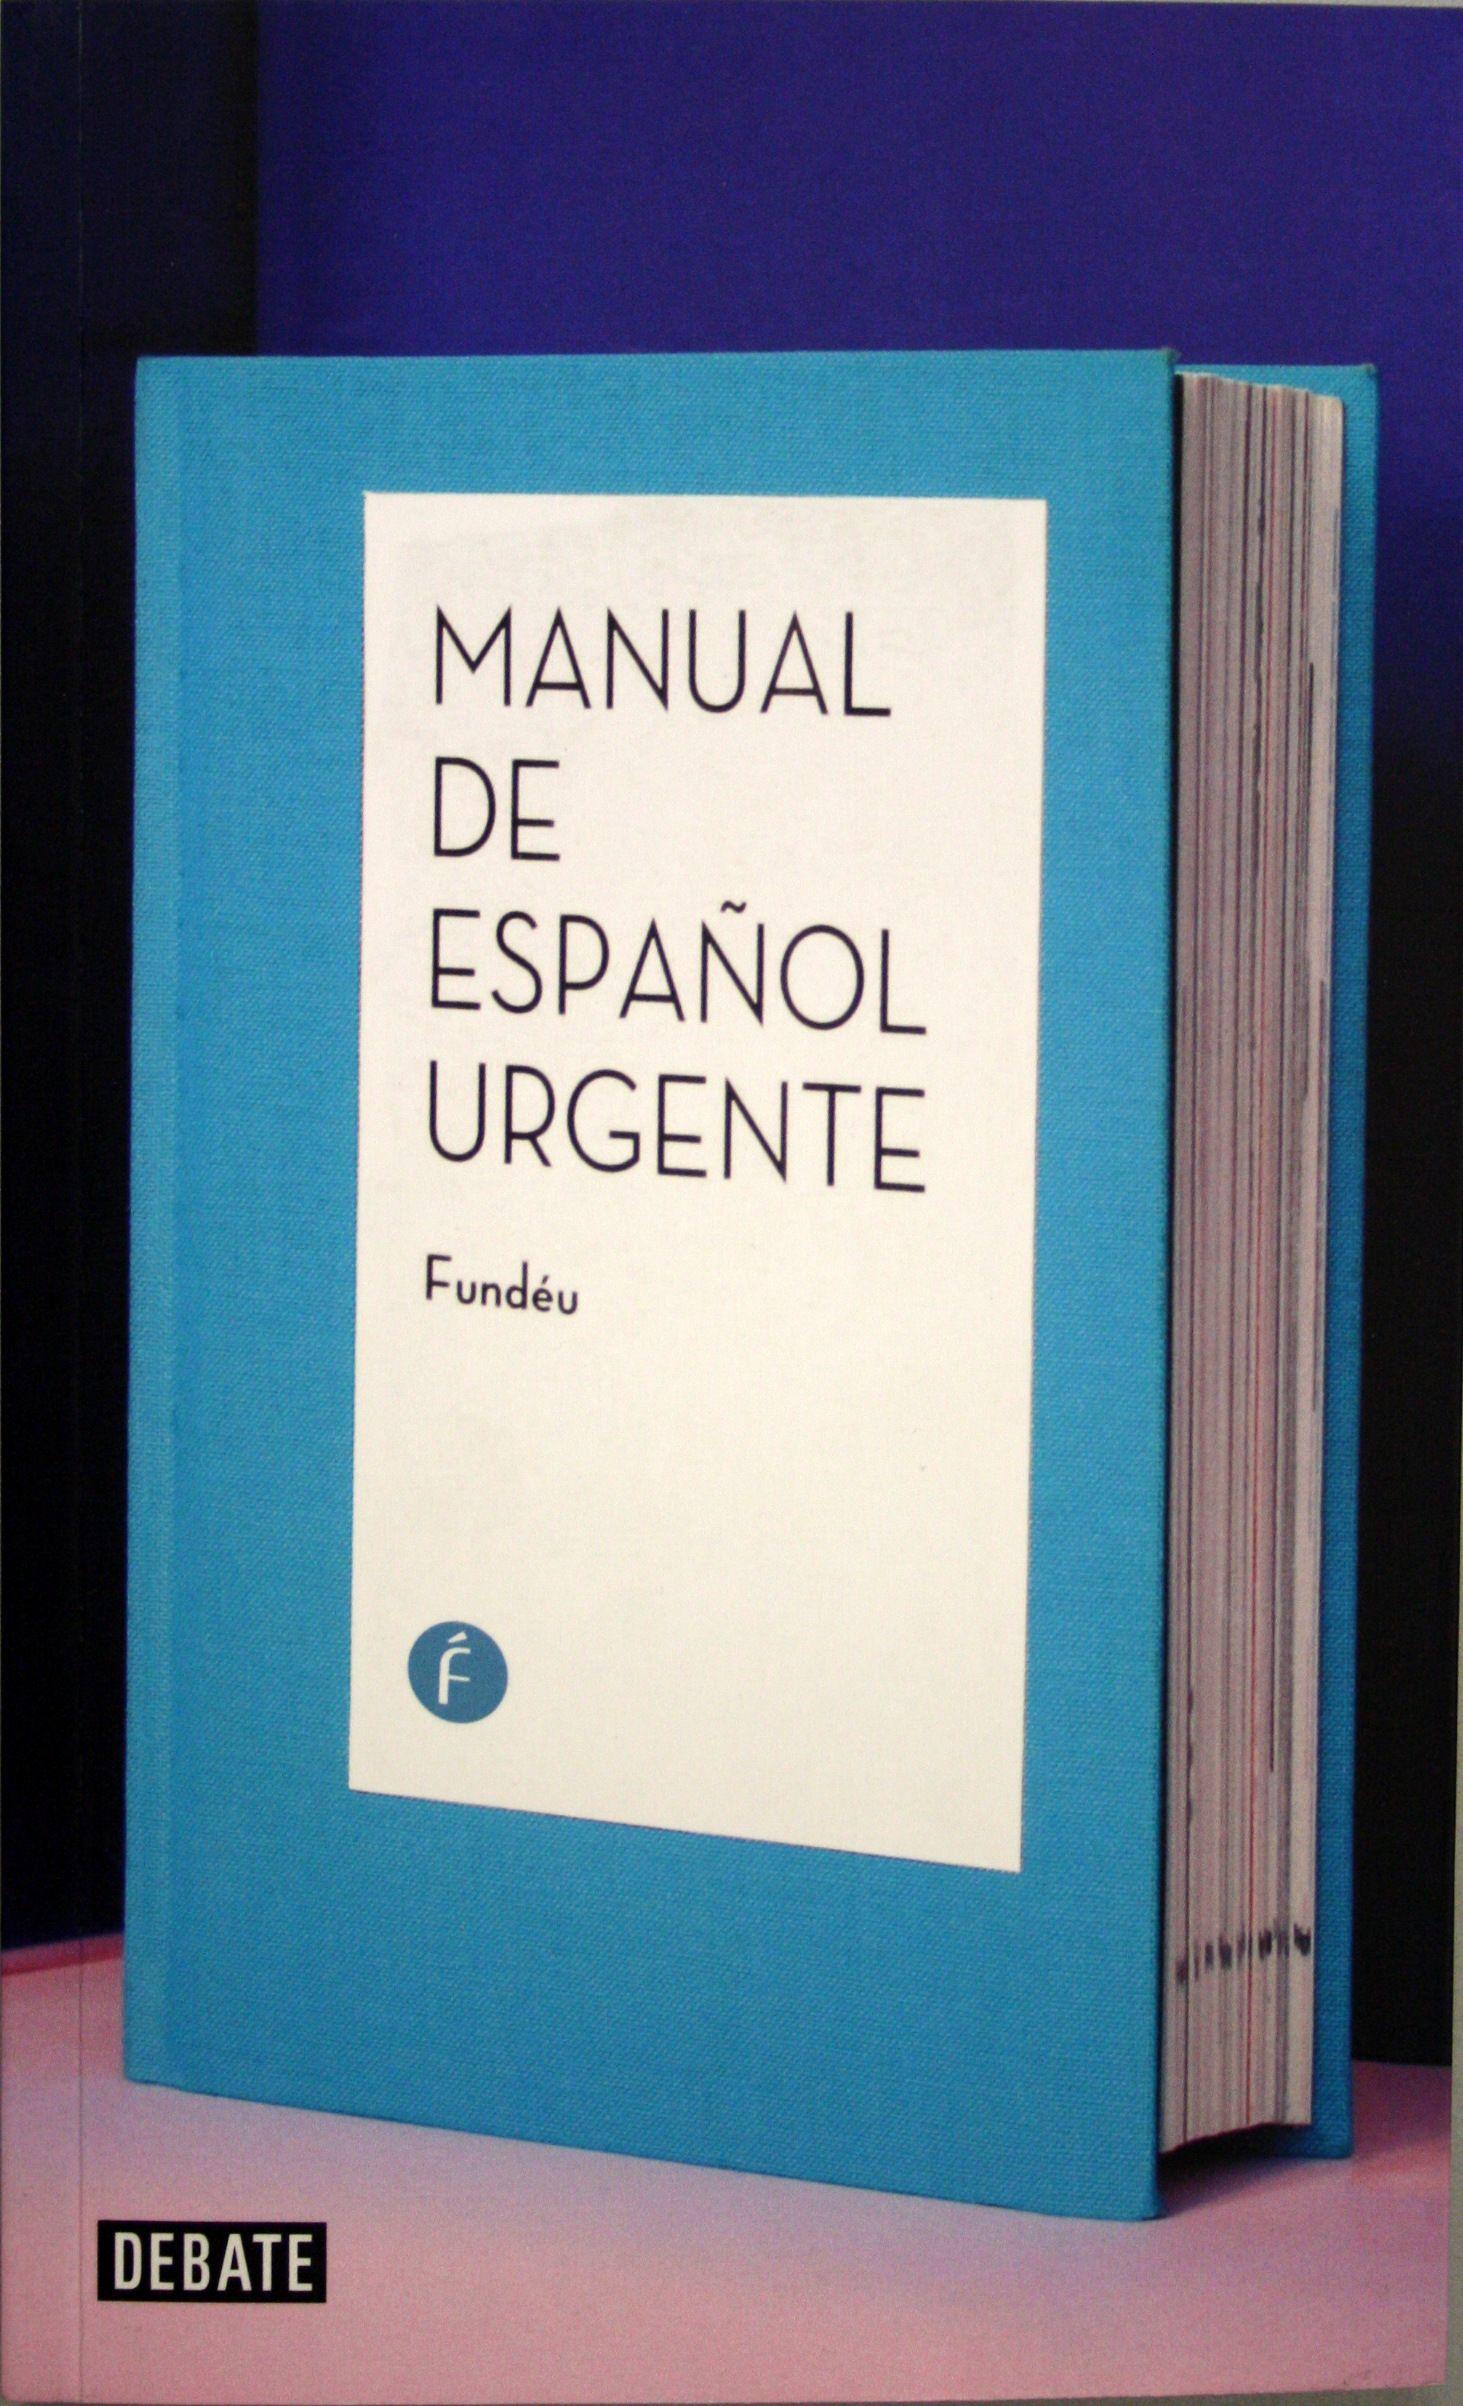 Manual De Espanol Urgente Fundeu Bbva Info